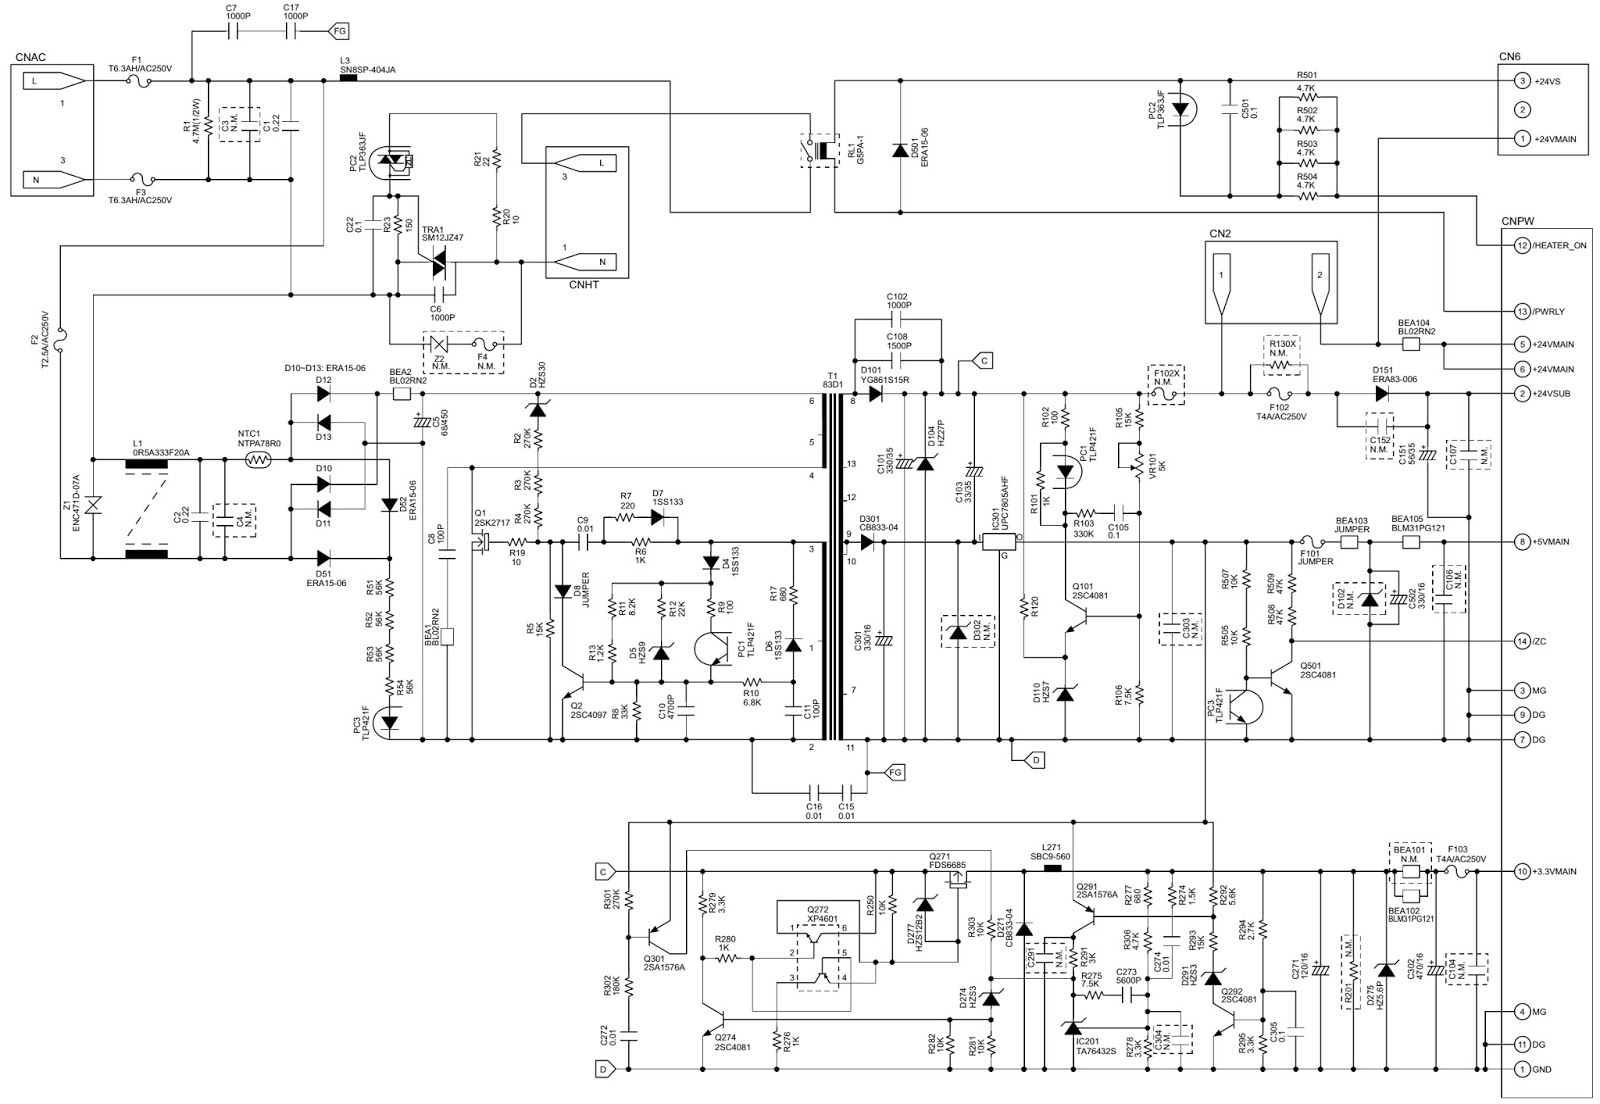 hp computer power supply wiring diagram hp power supply wiring diagramrh svlc us [ 1600 x 1104 Pixel ]